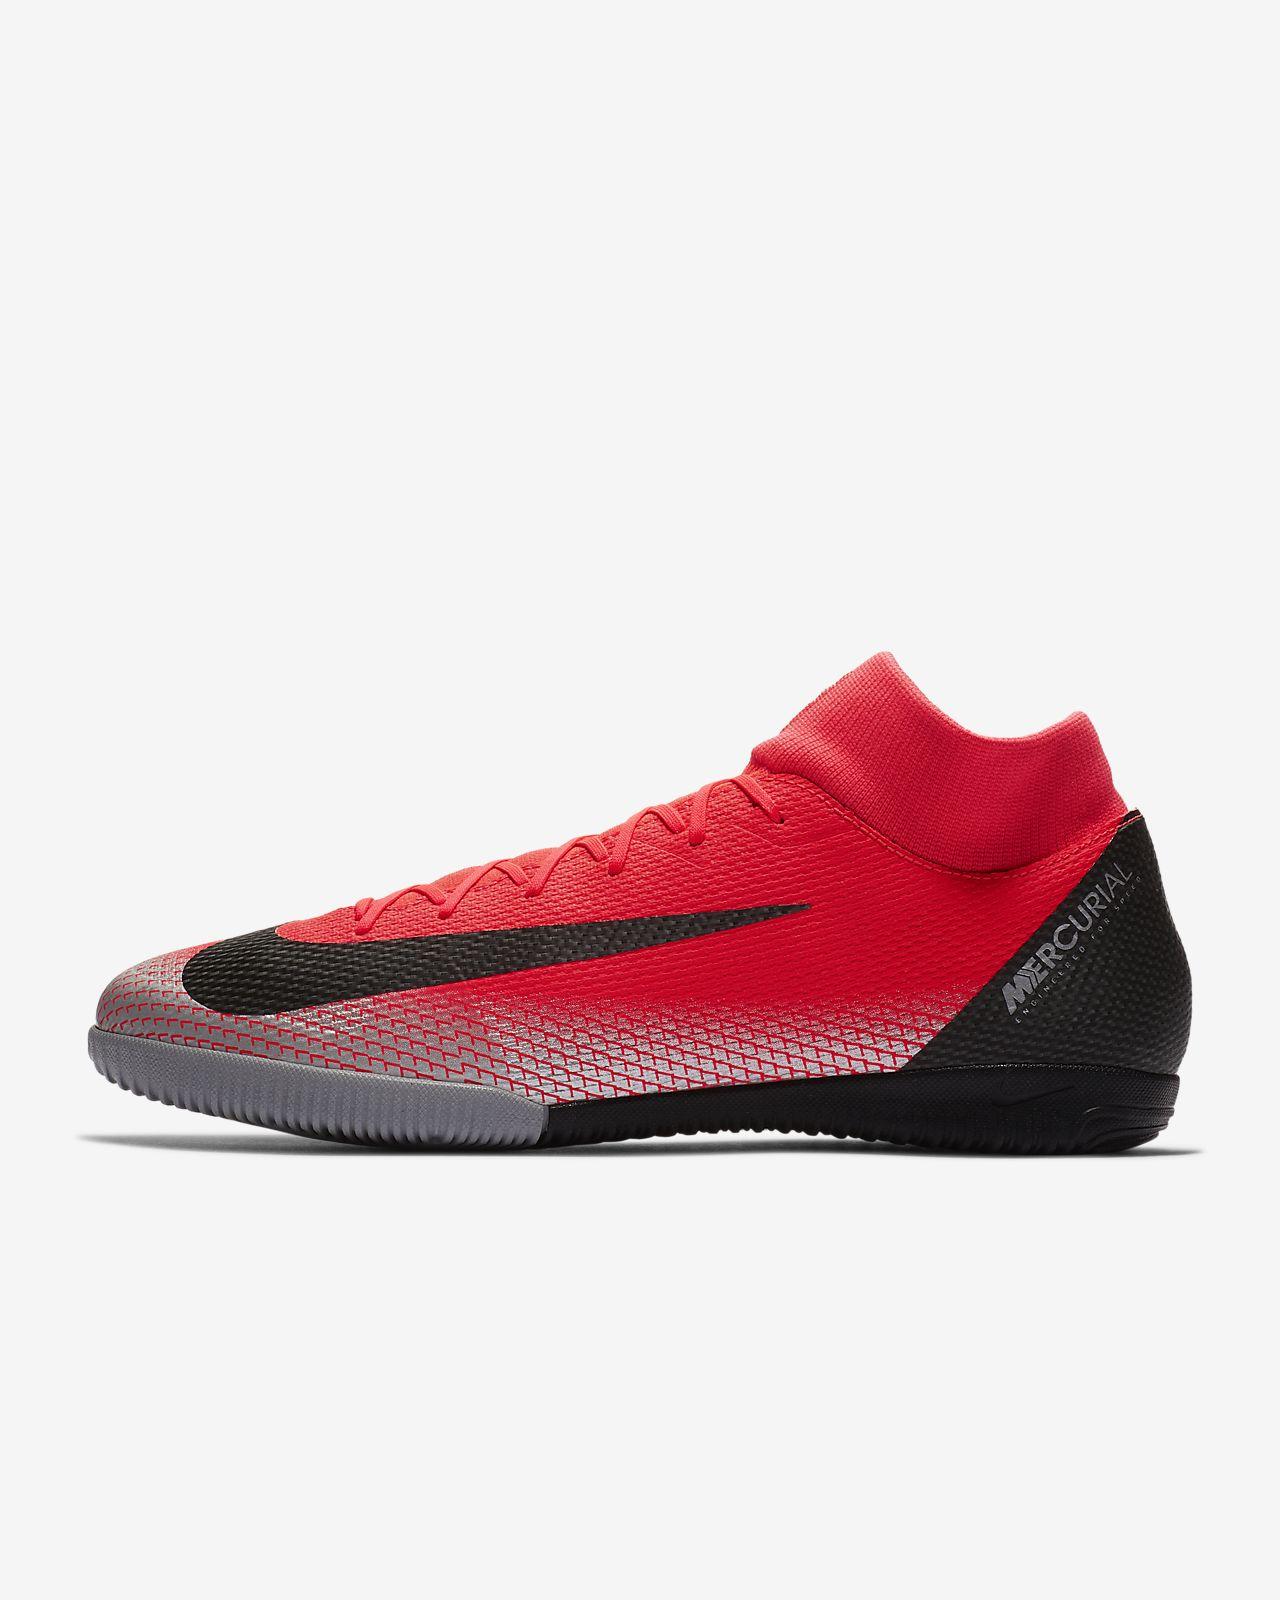 Scarpa da calcio per campi indoor Nike MercurialX Superfly VI Academy CR7 IC